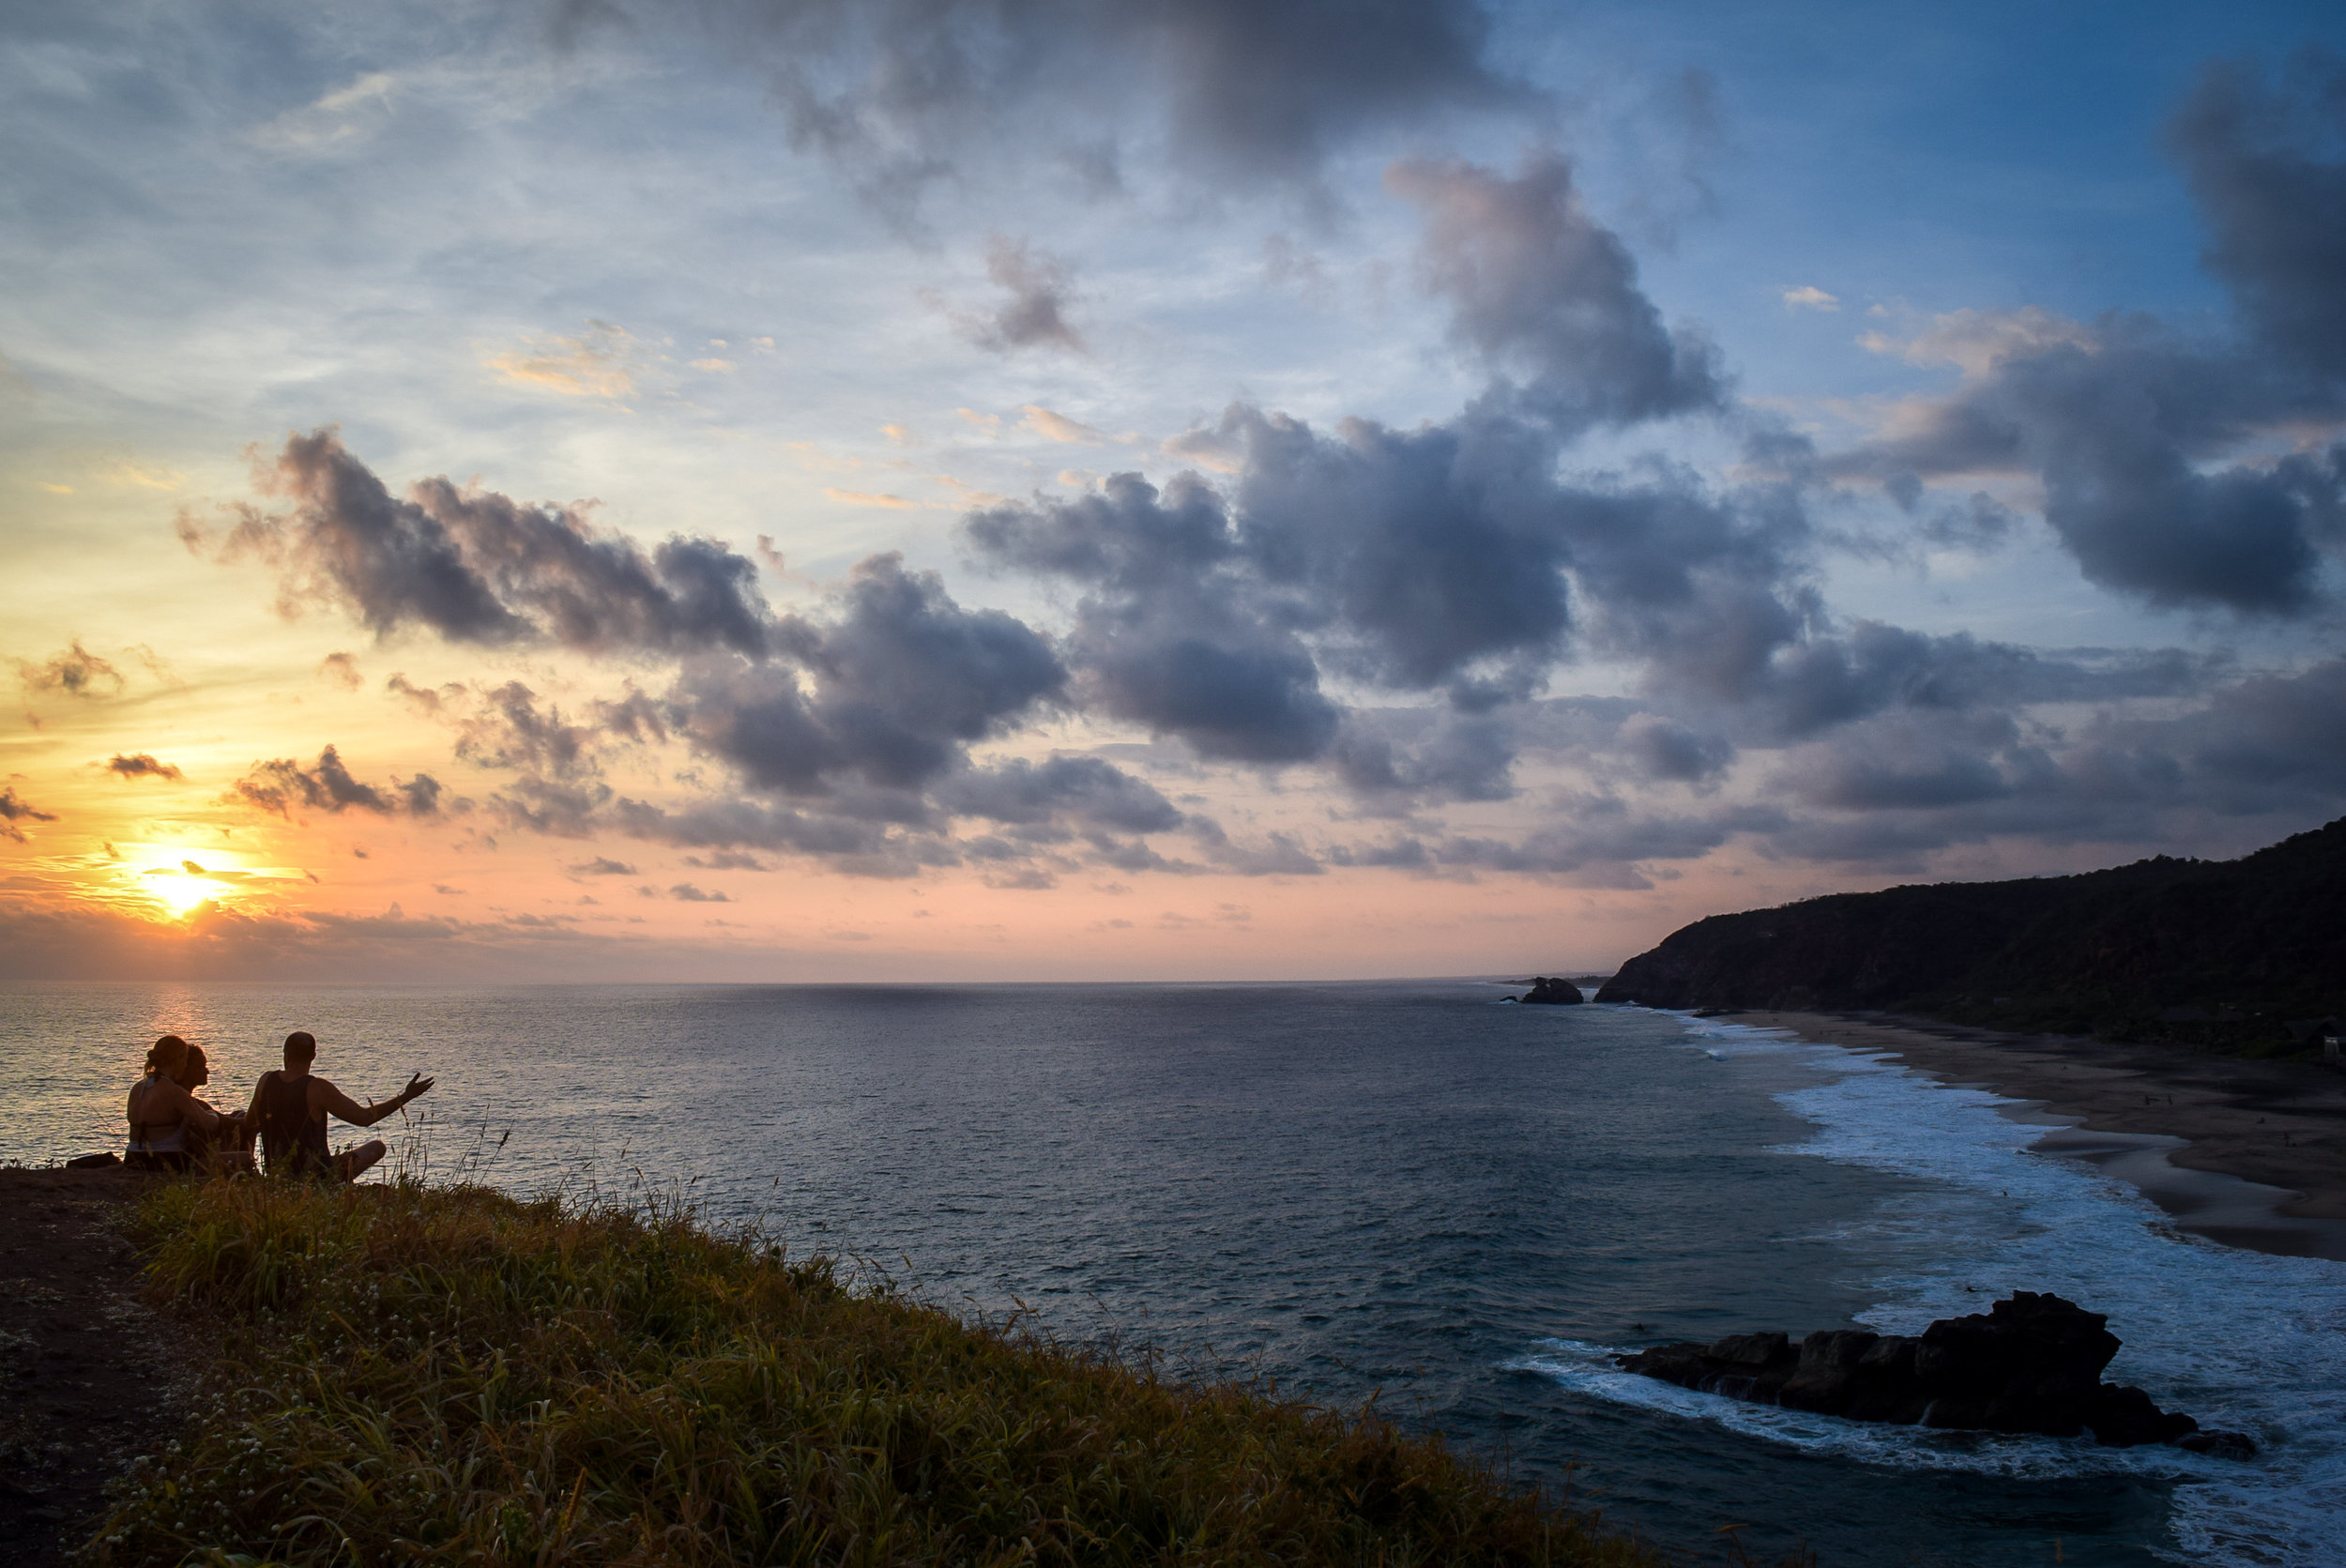 Sunset at Punta Cometa